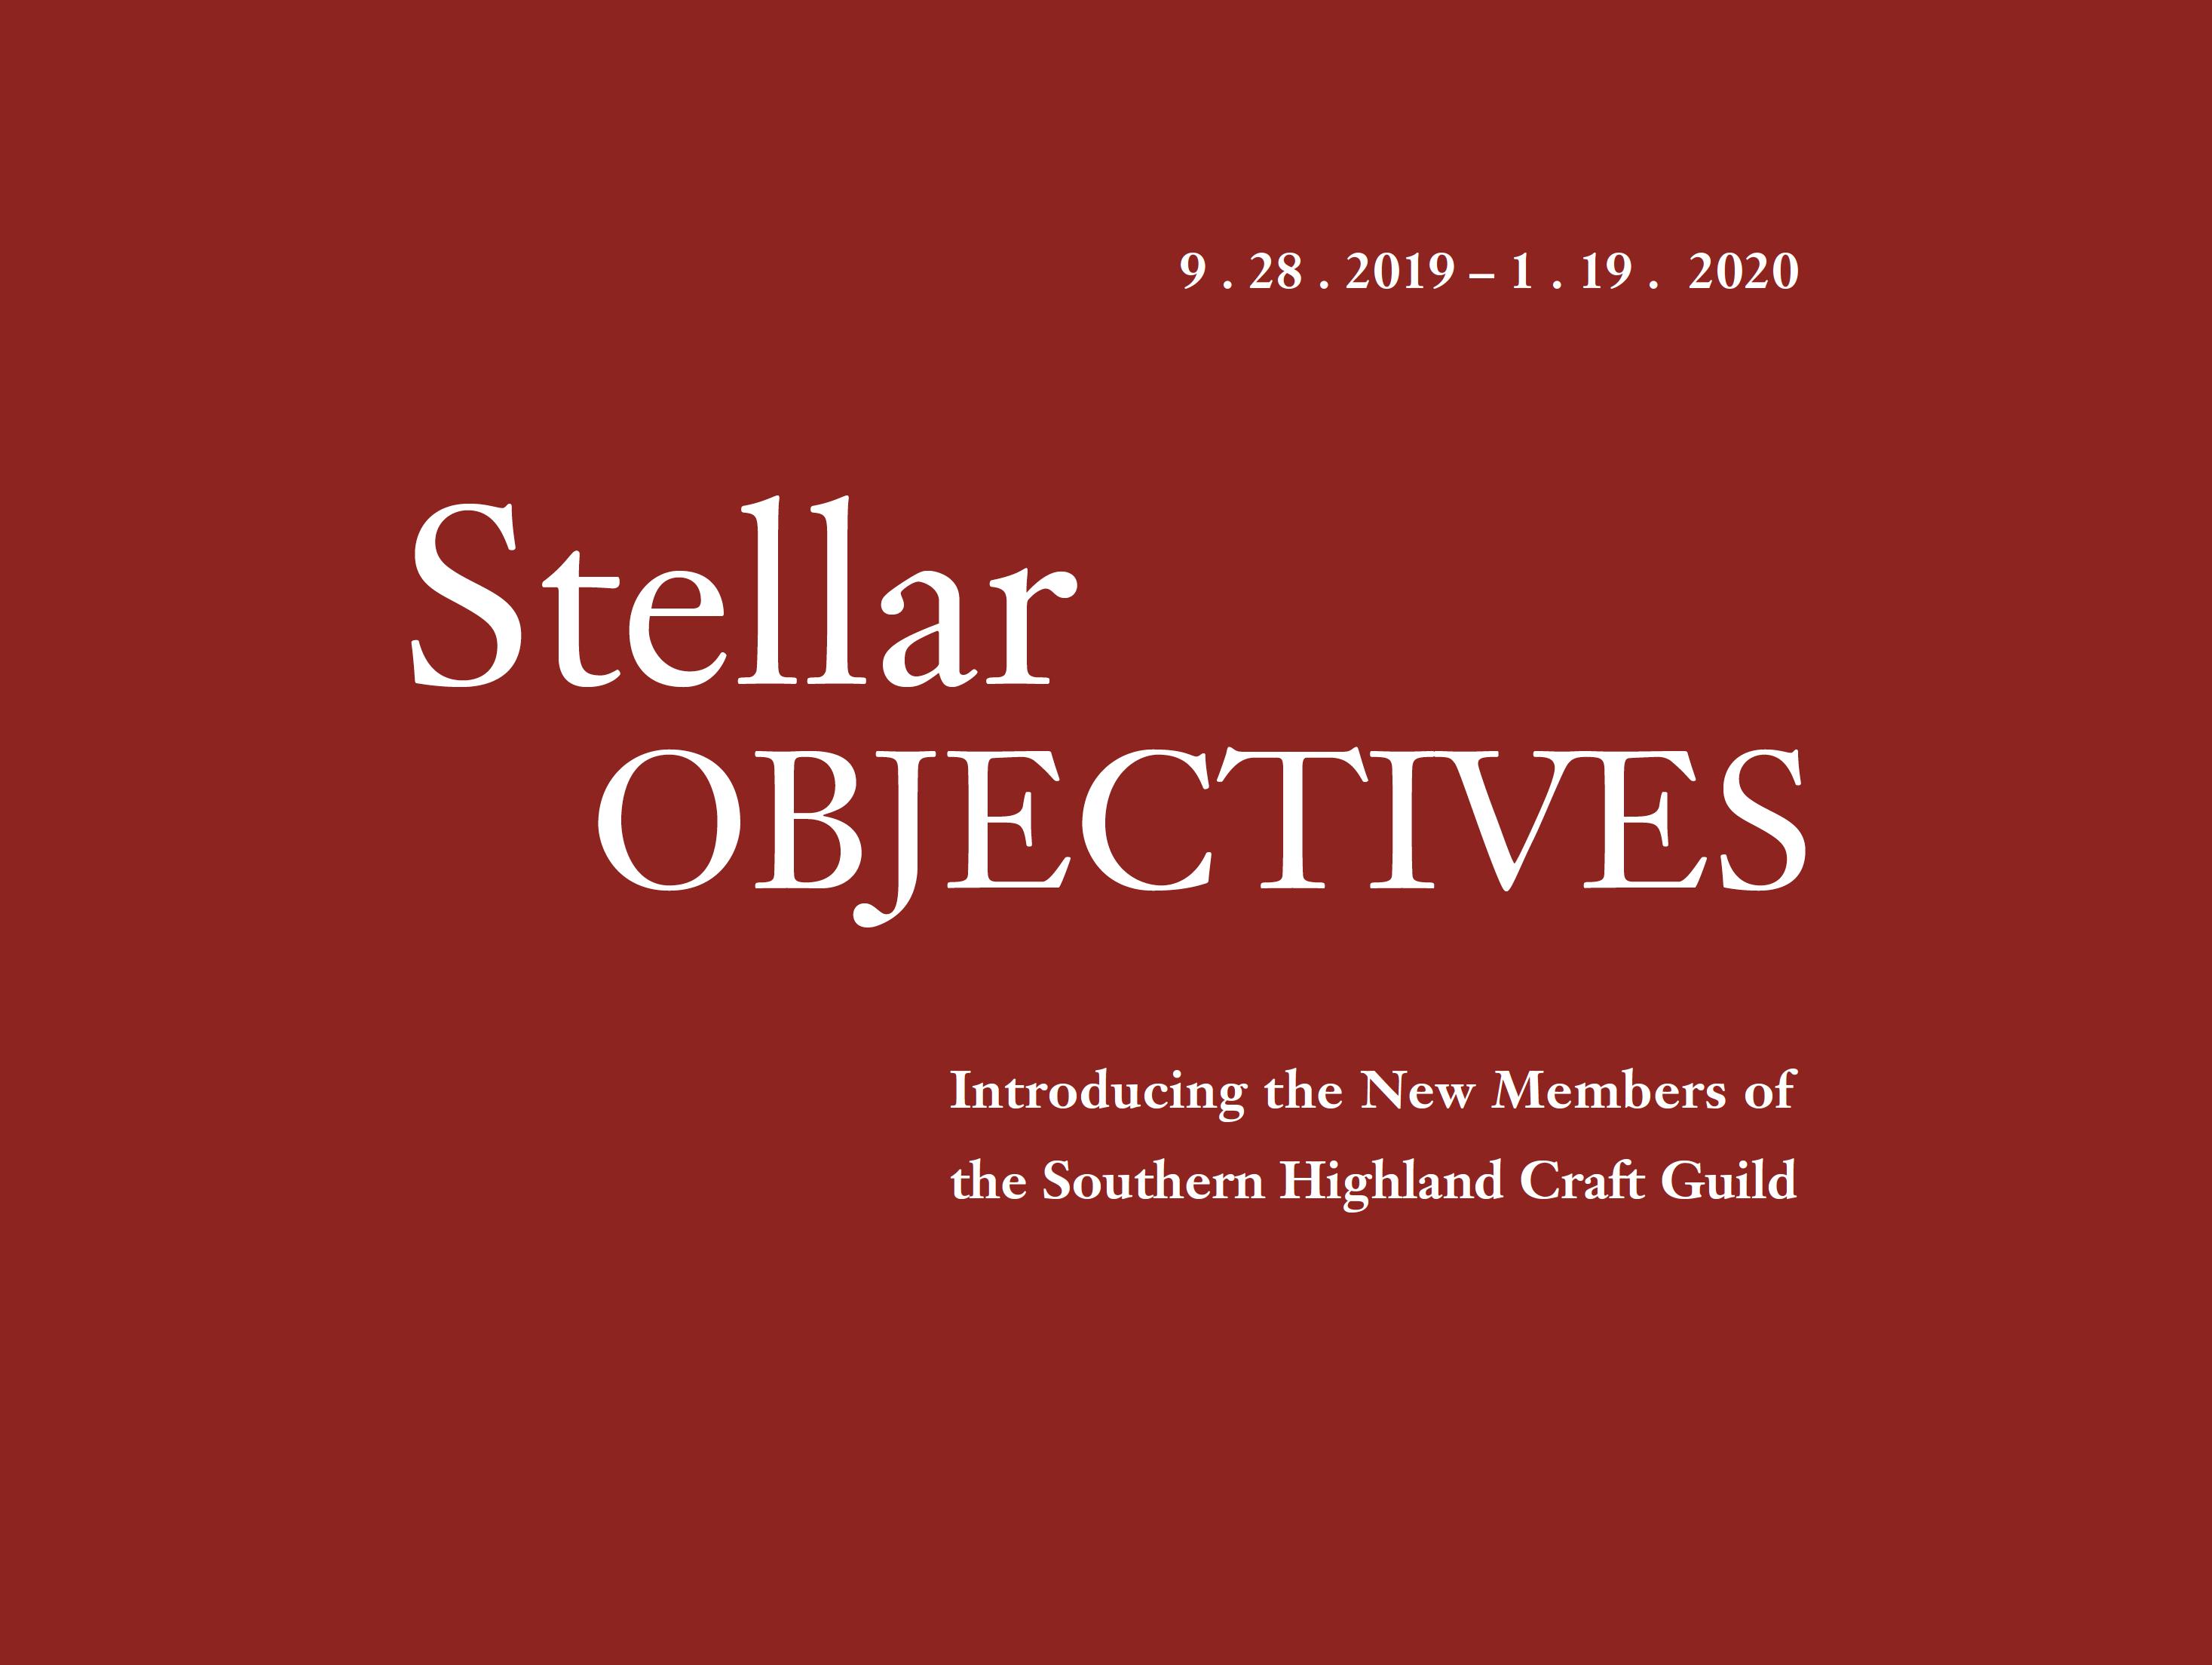 Stellar Objectives